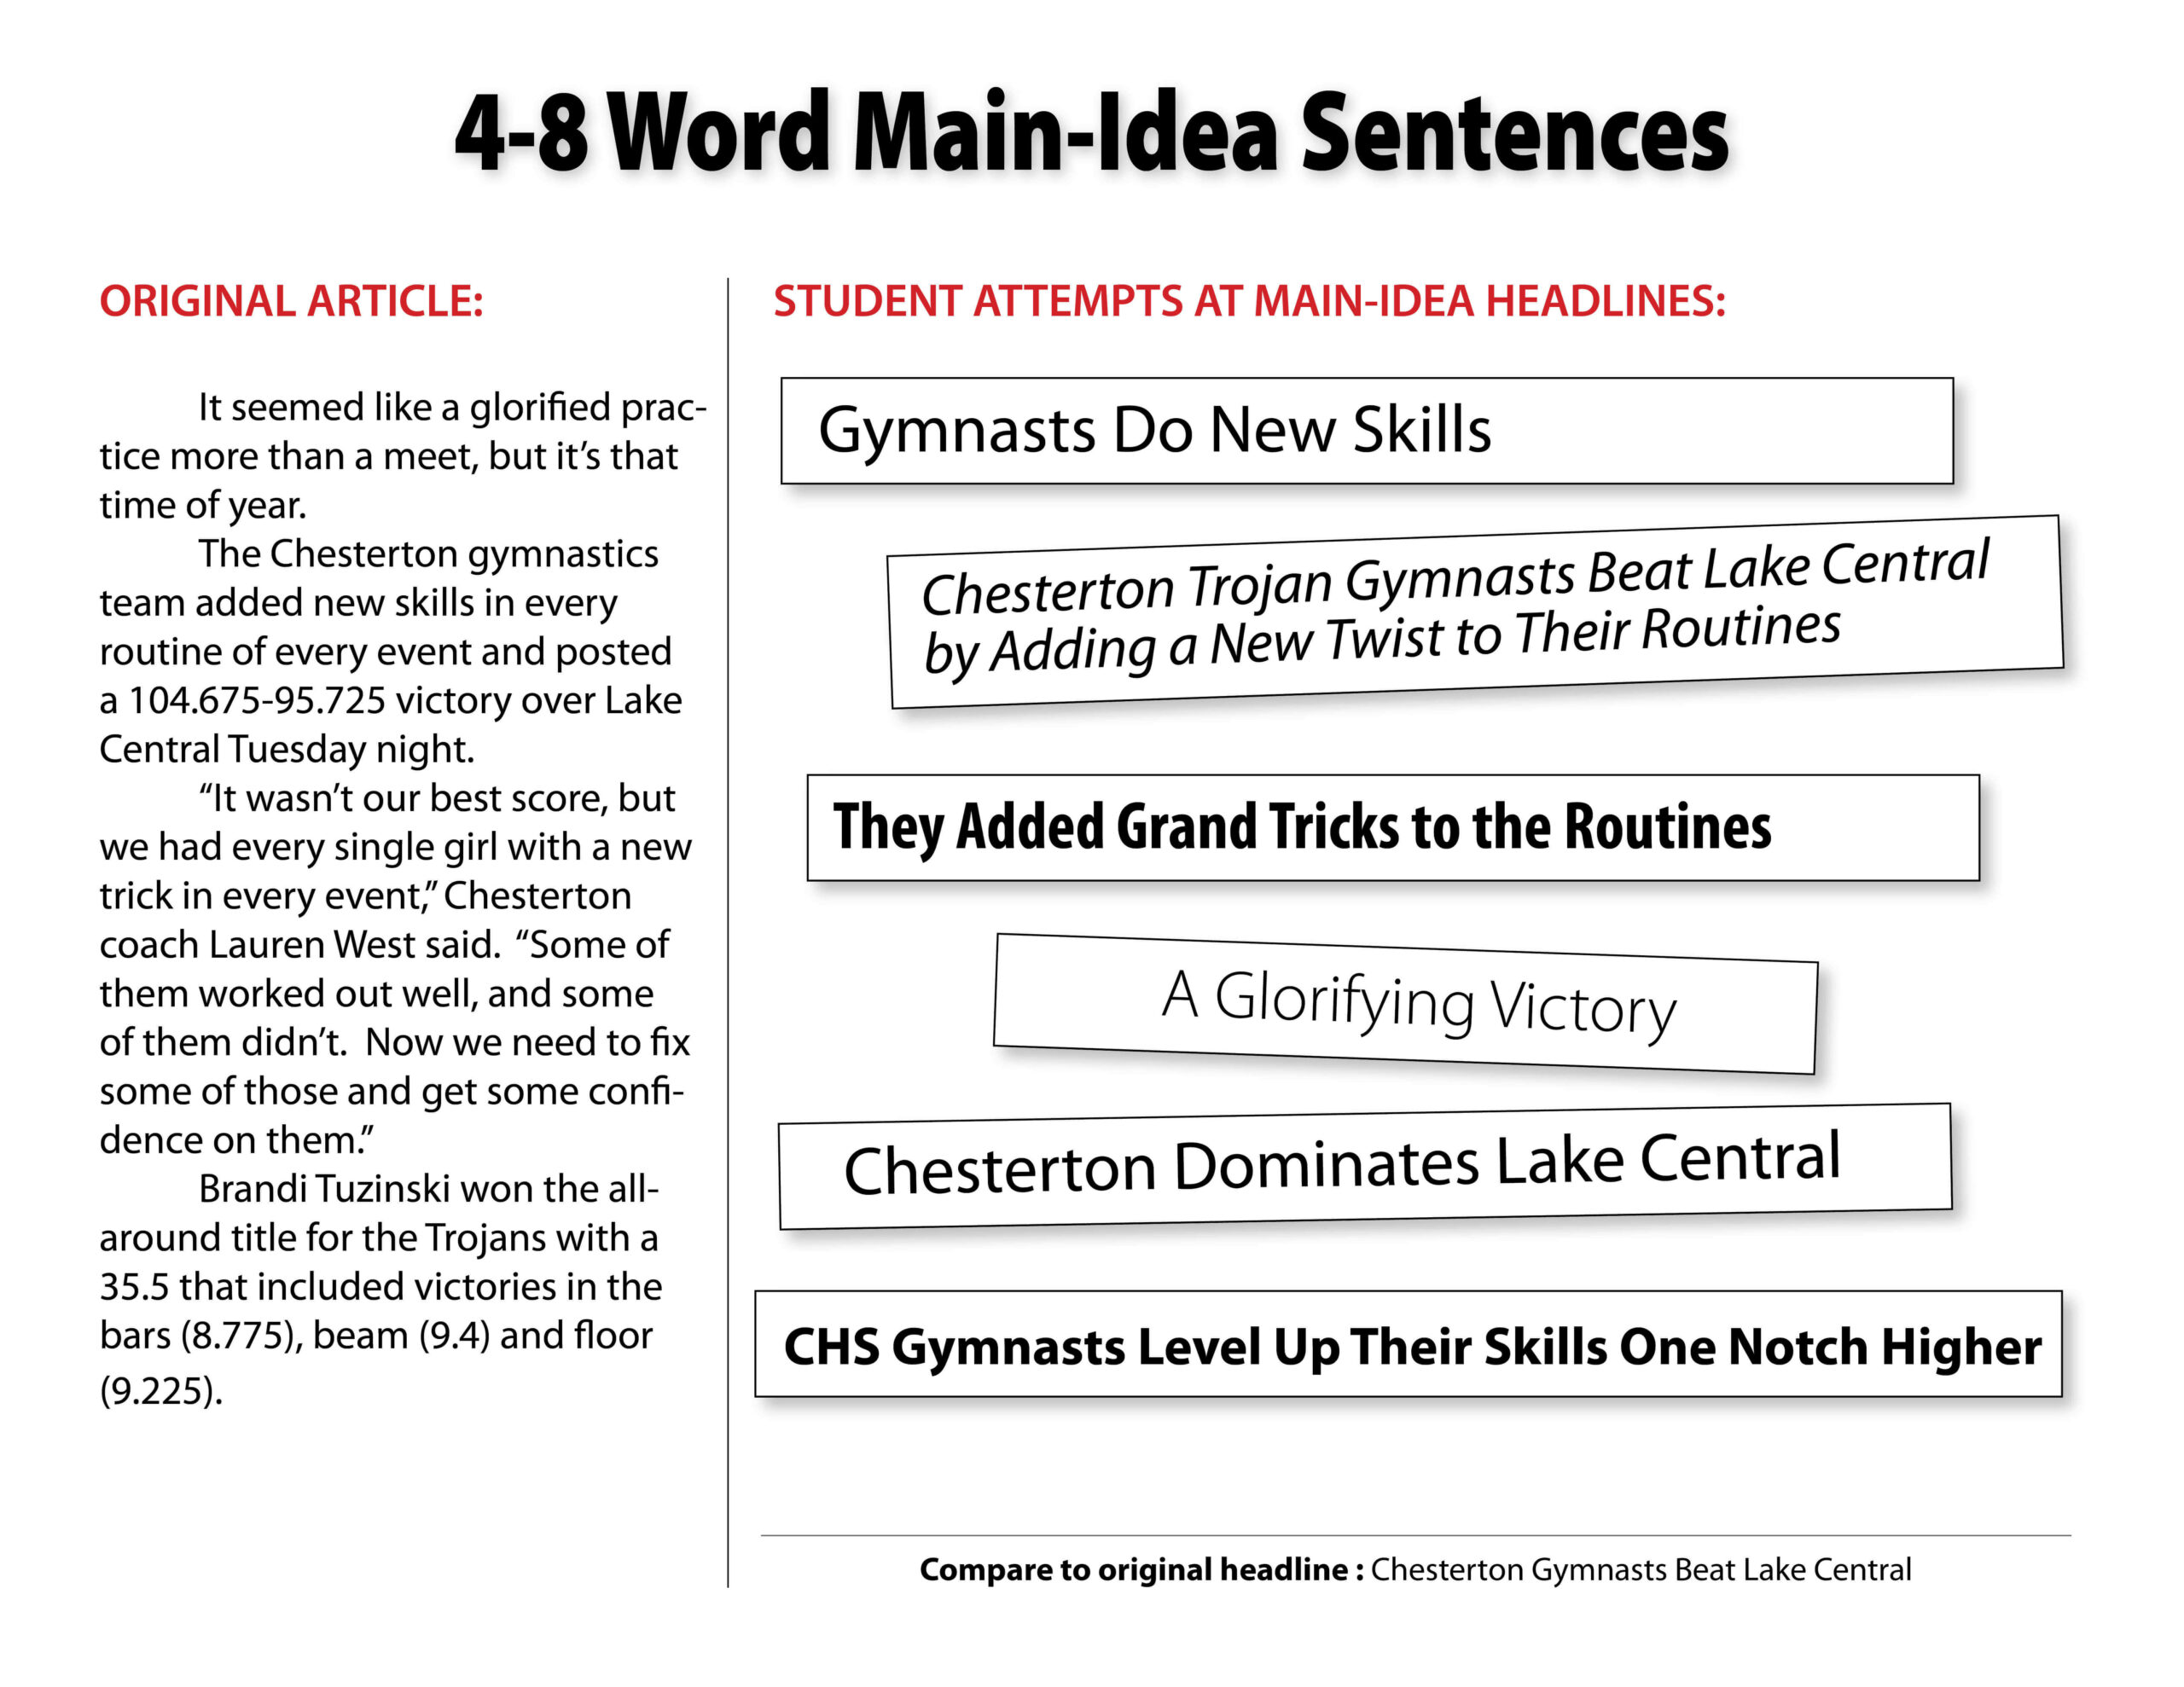 Main-Idea Headlines Samples